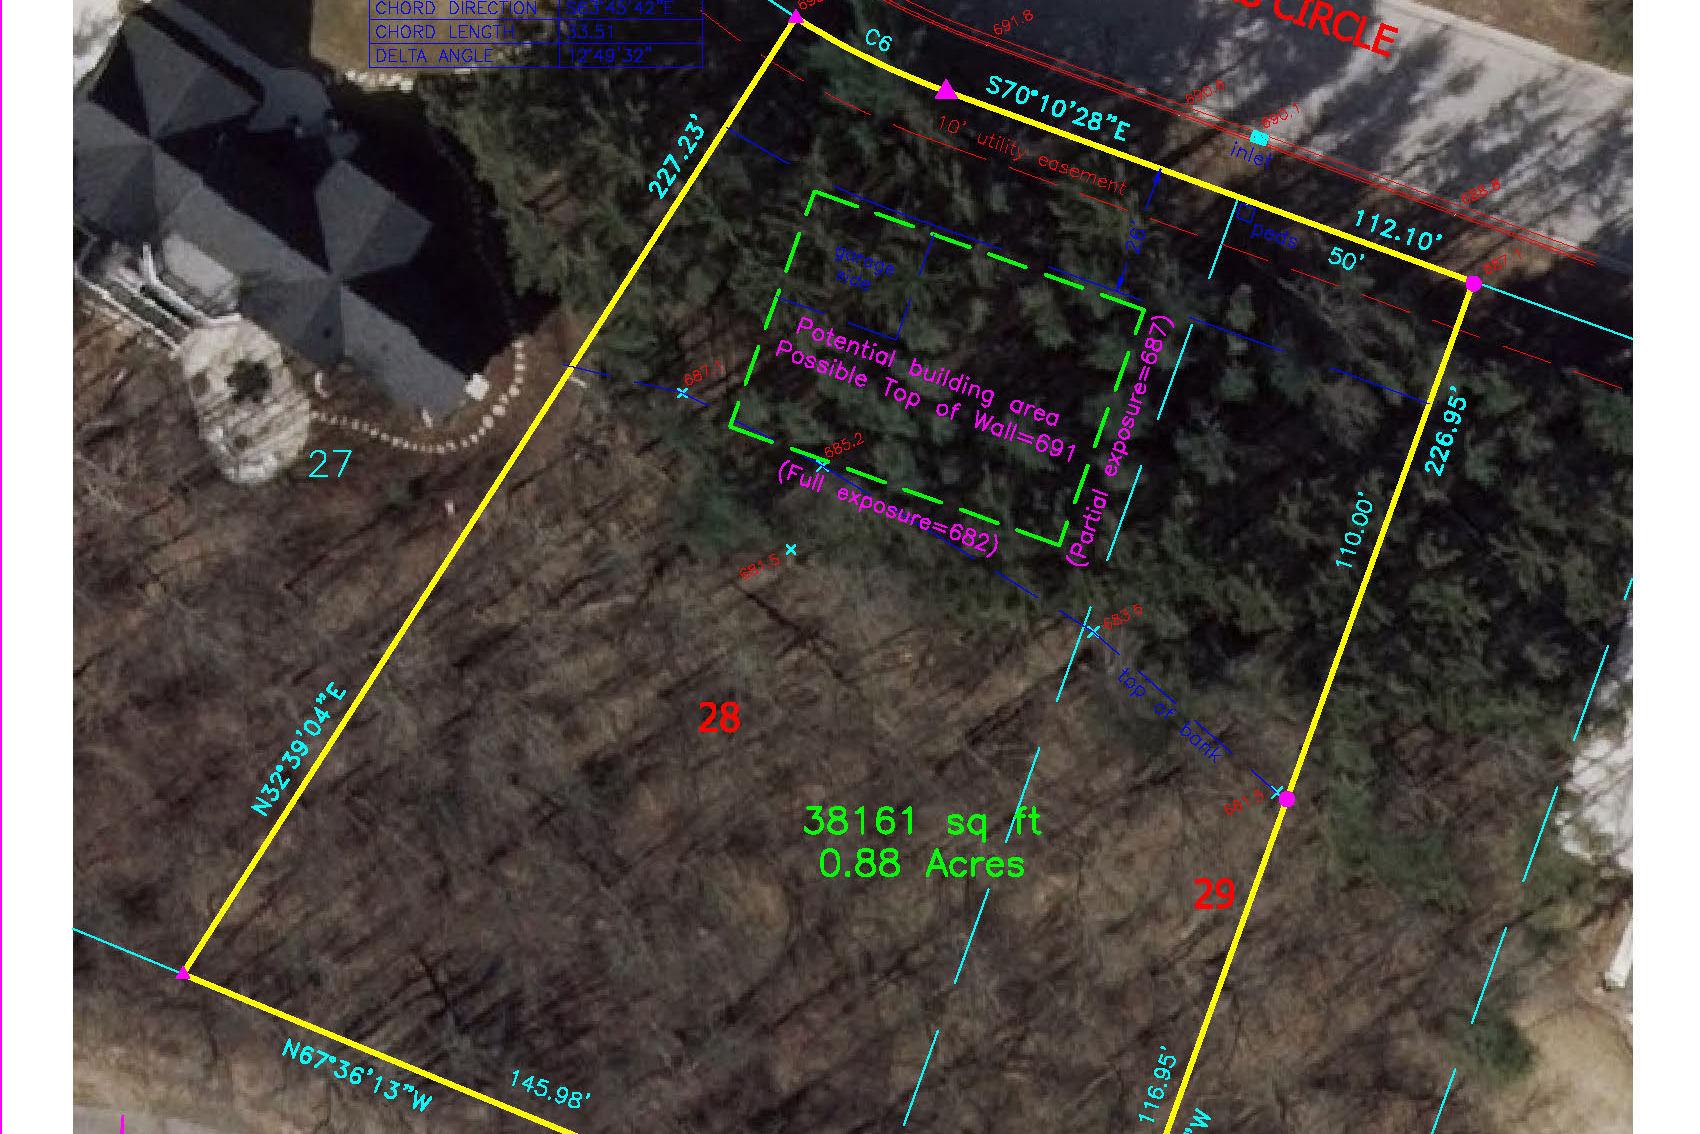 Lot 28: .88 Acres  – SOLD